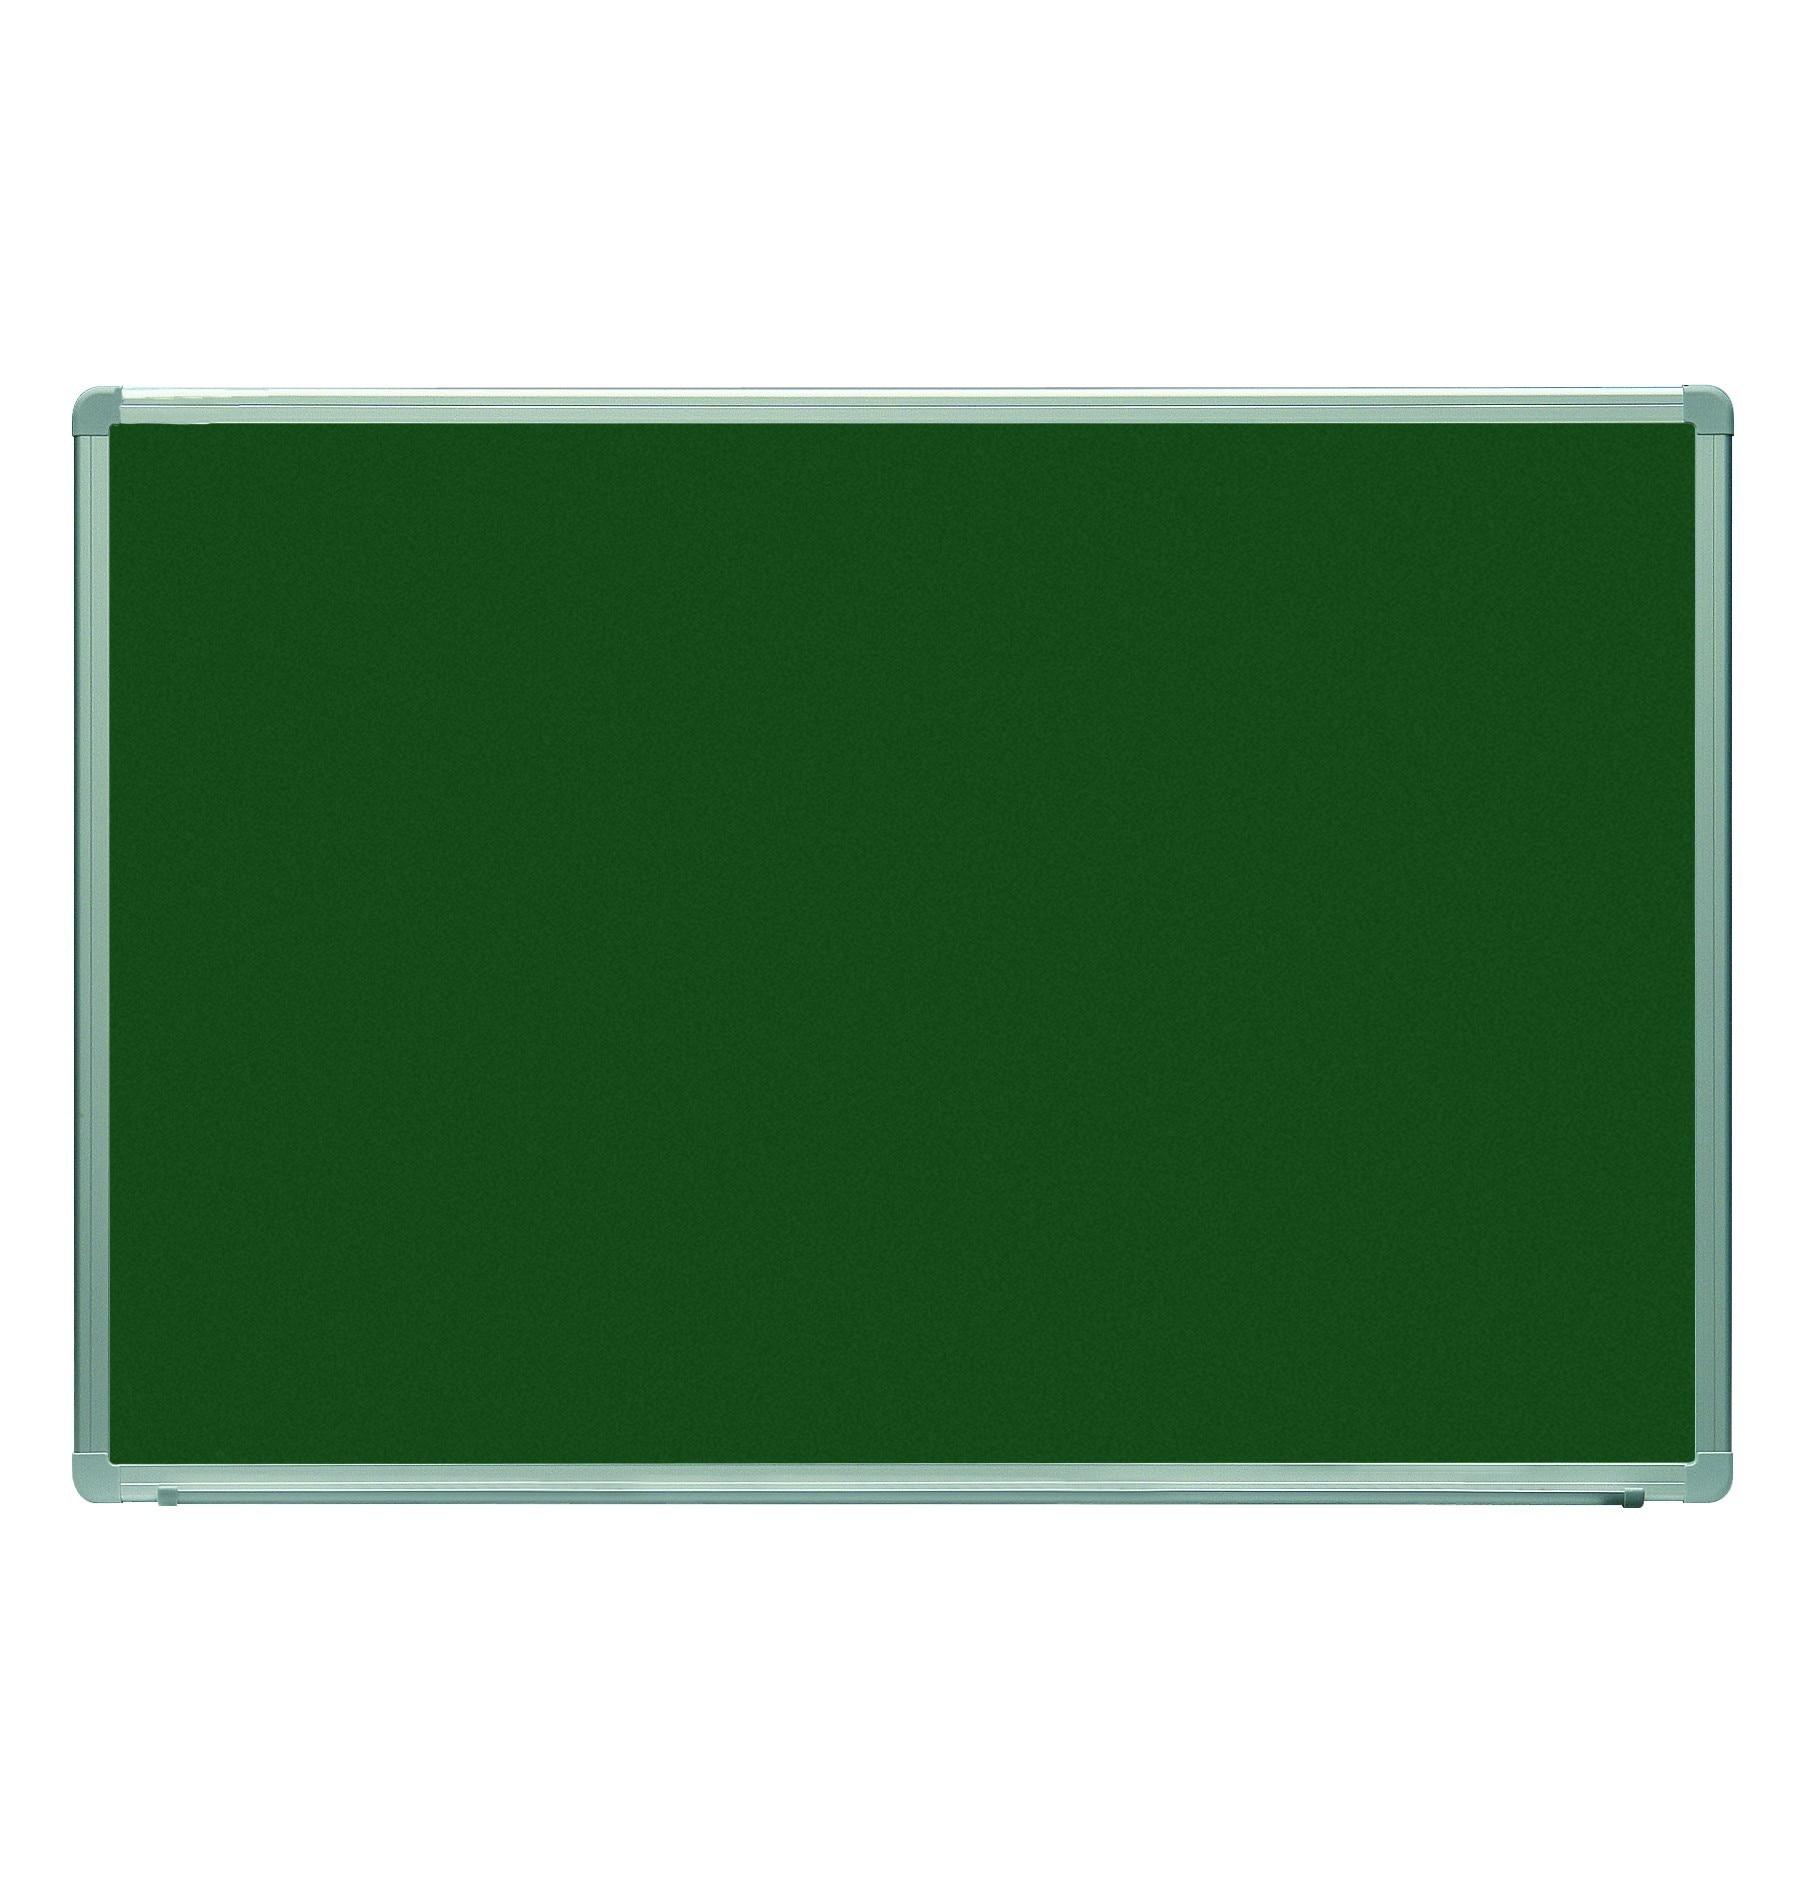 SLATE VITRIFIED GREEN MARCO ALUMINUM 'S 150X120cm